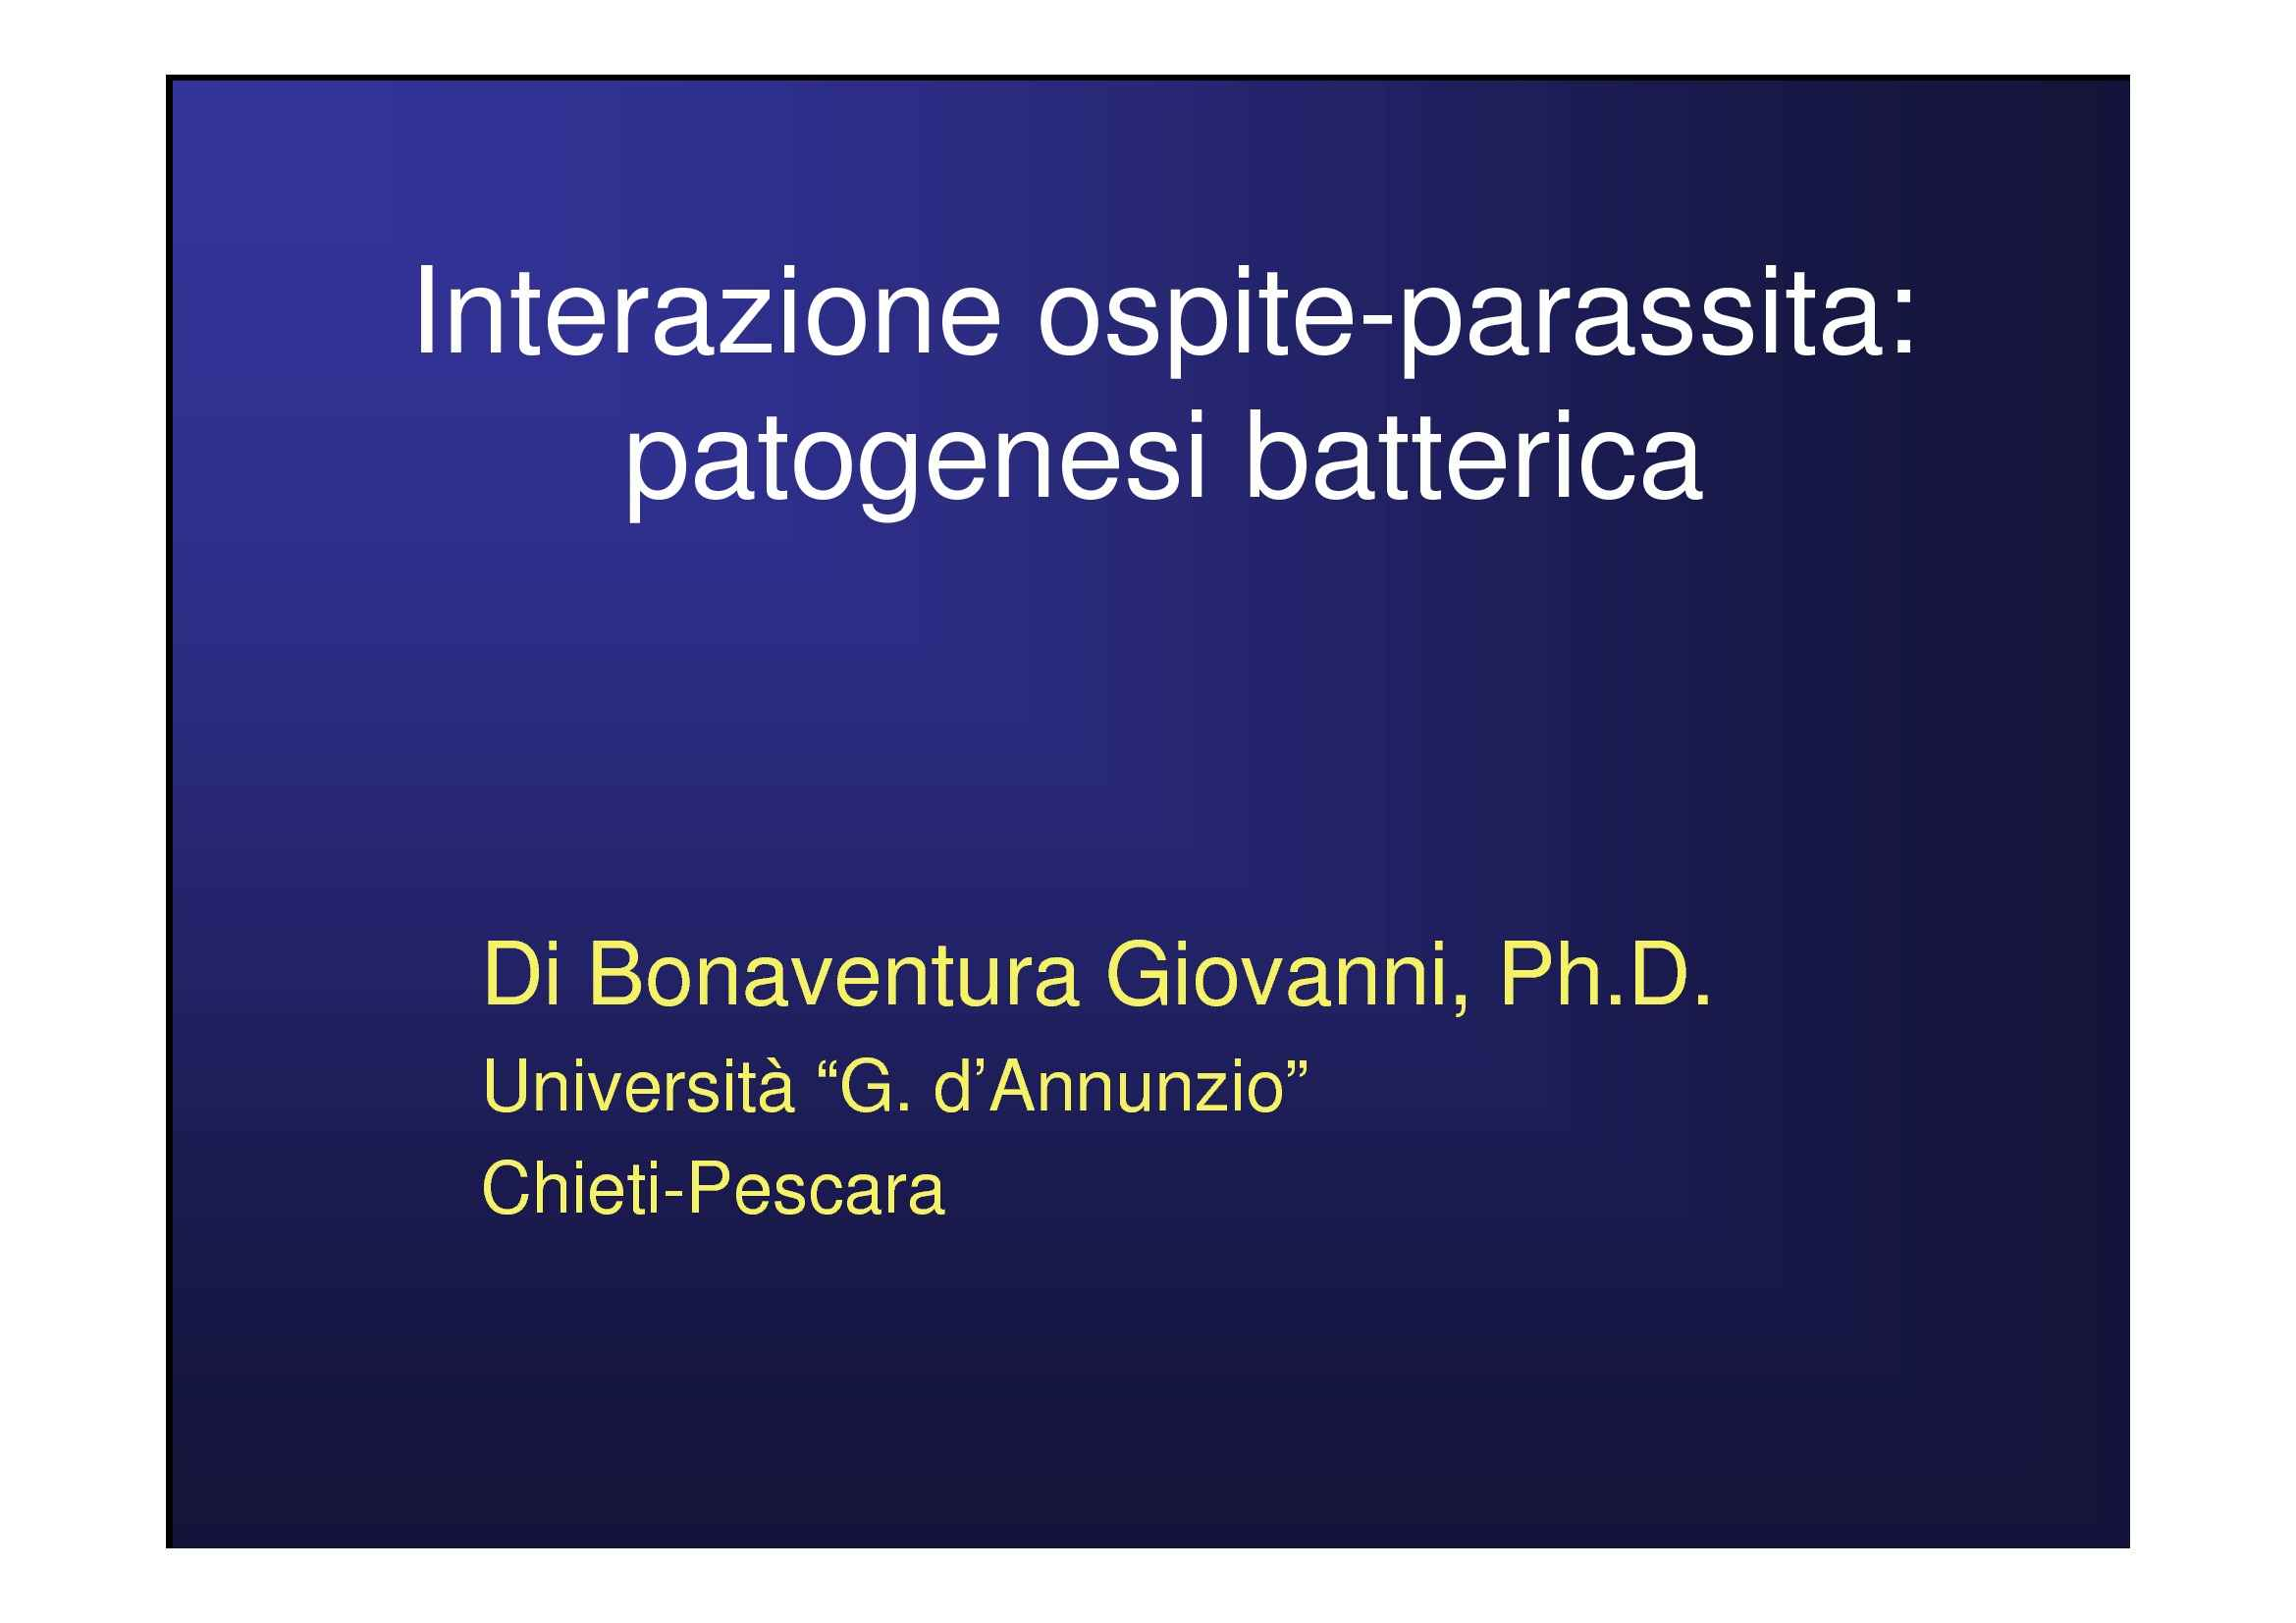 Patogenesi batterica - Parassita e simbionte